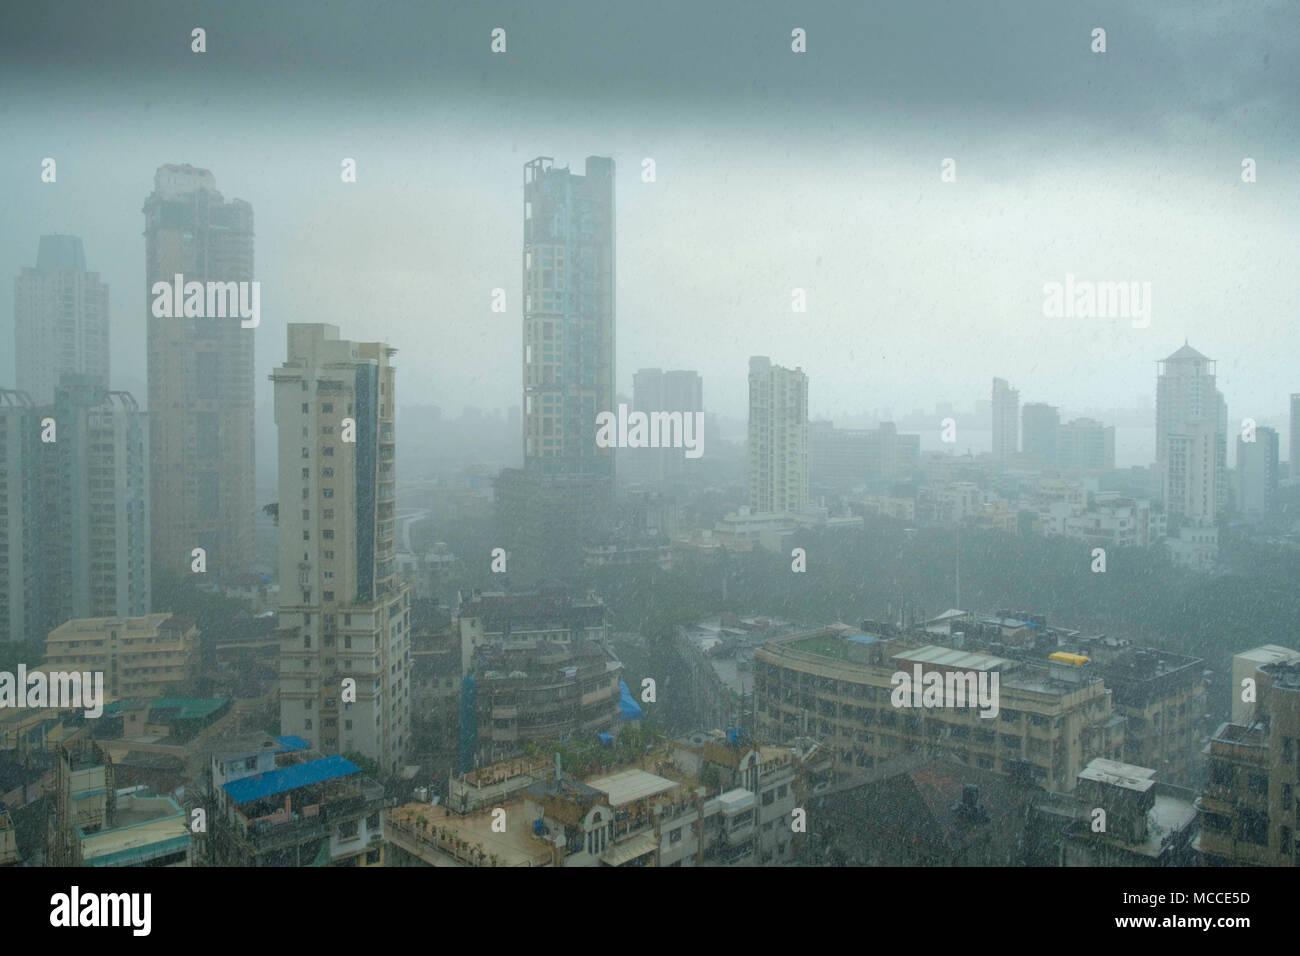 Skyline of Mumbai during heavy monsoon rain - Stock Image